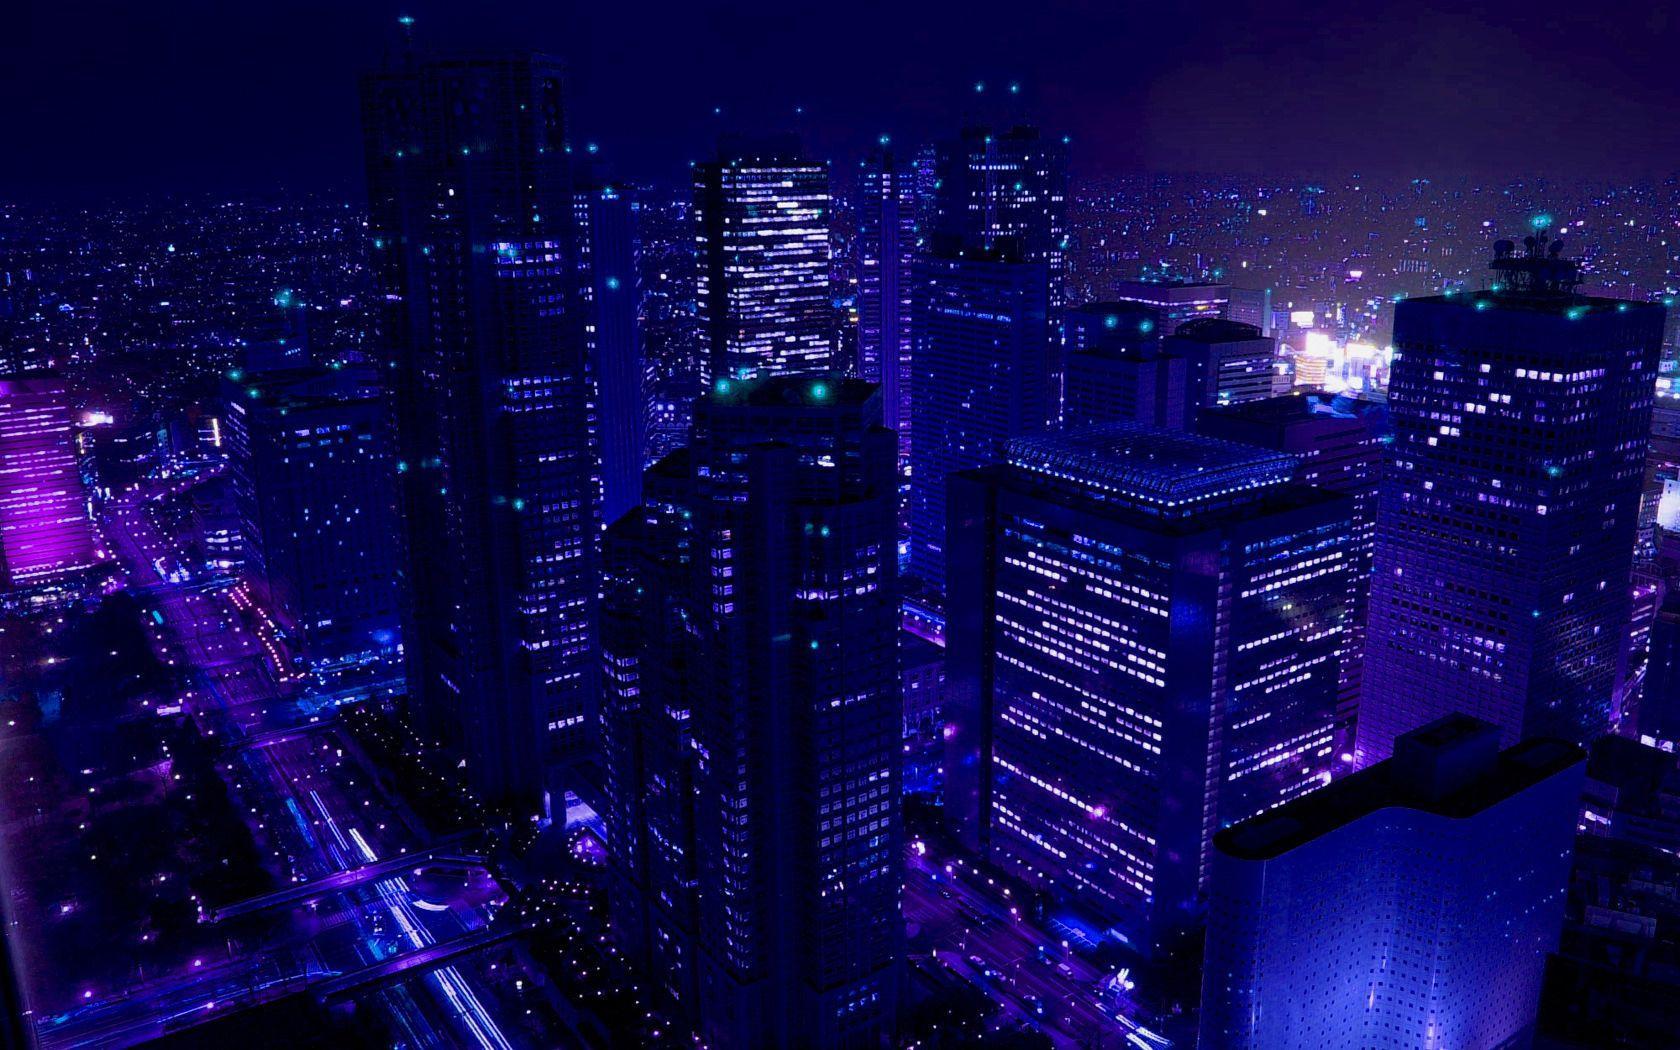 blue anime aesthetic city